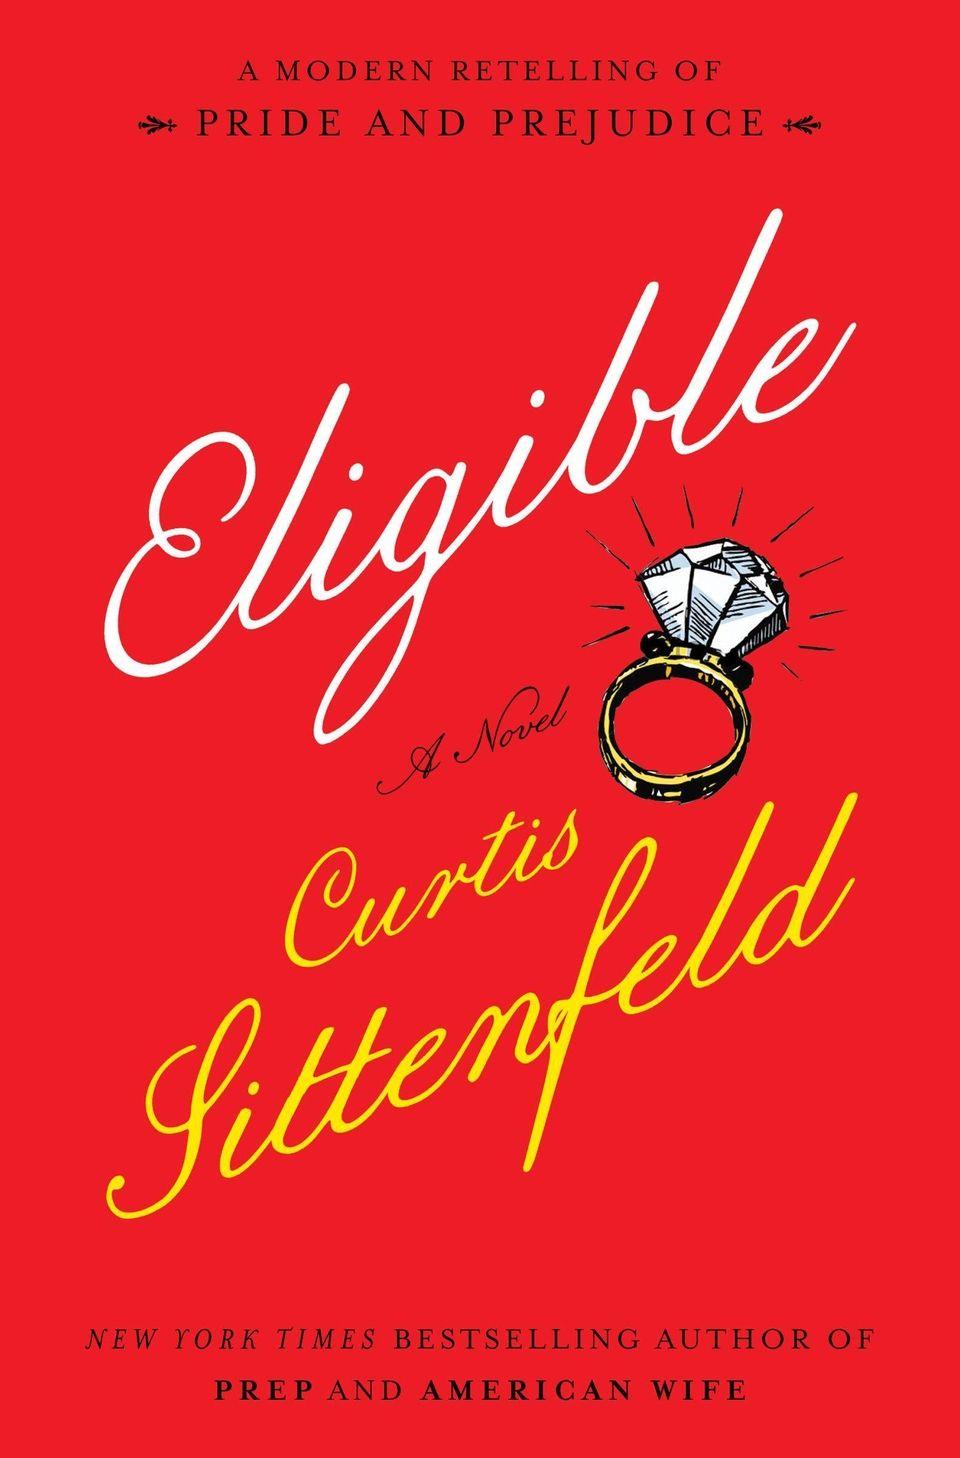 "Curtis Sittenfeld's new novel recasts ""Pride and Prejudice"""